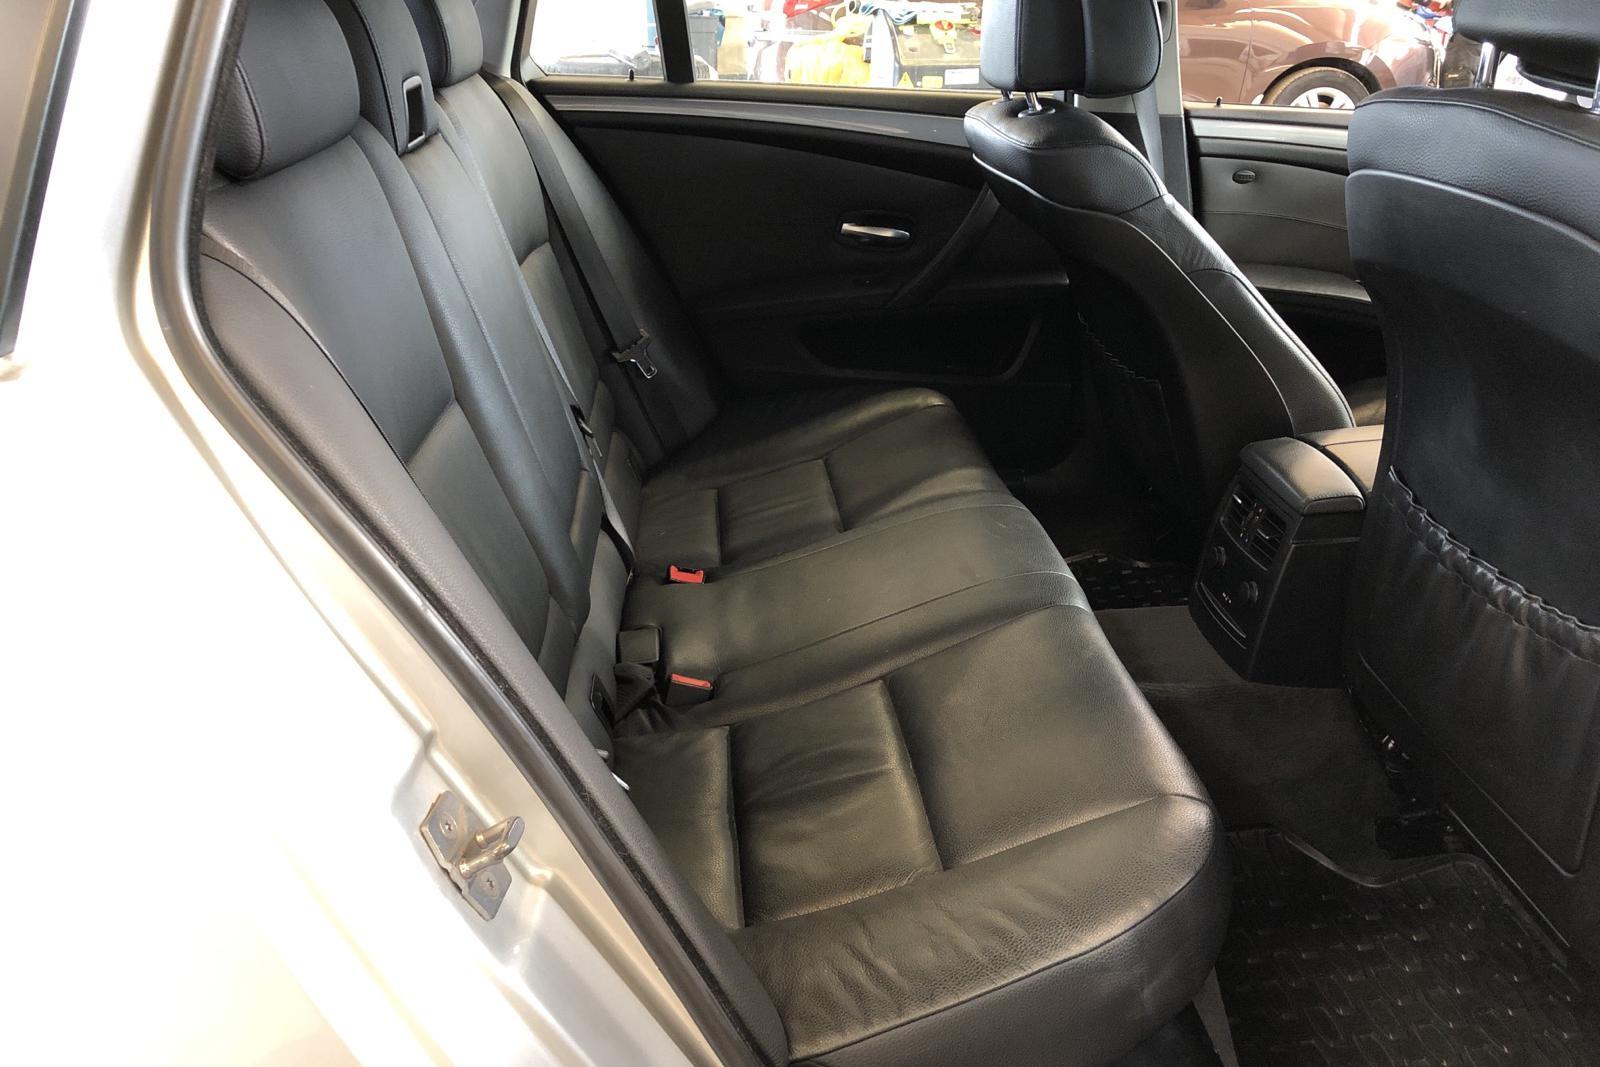 BMW 520d Touring, E61 (177hk) - 197 440 km - Automatic - Light Grey - 2010